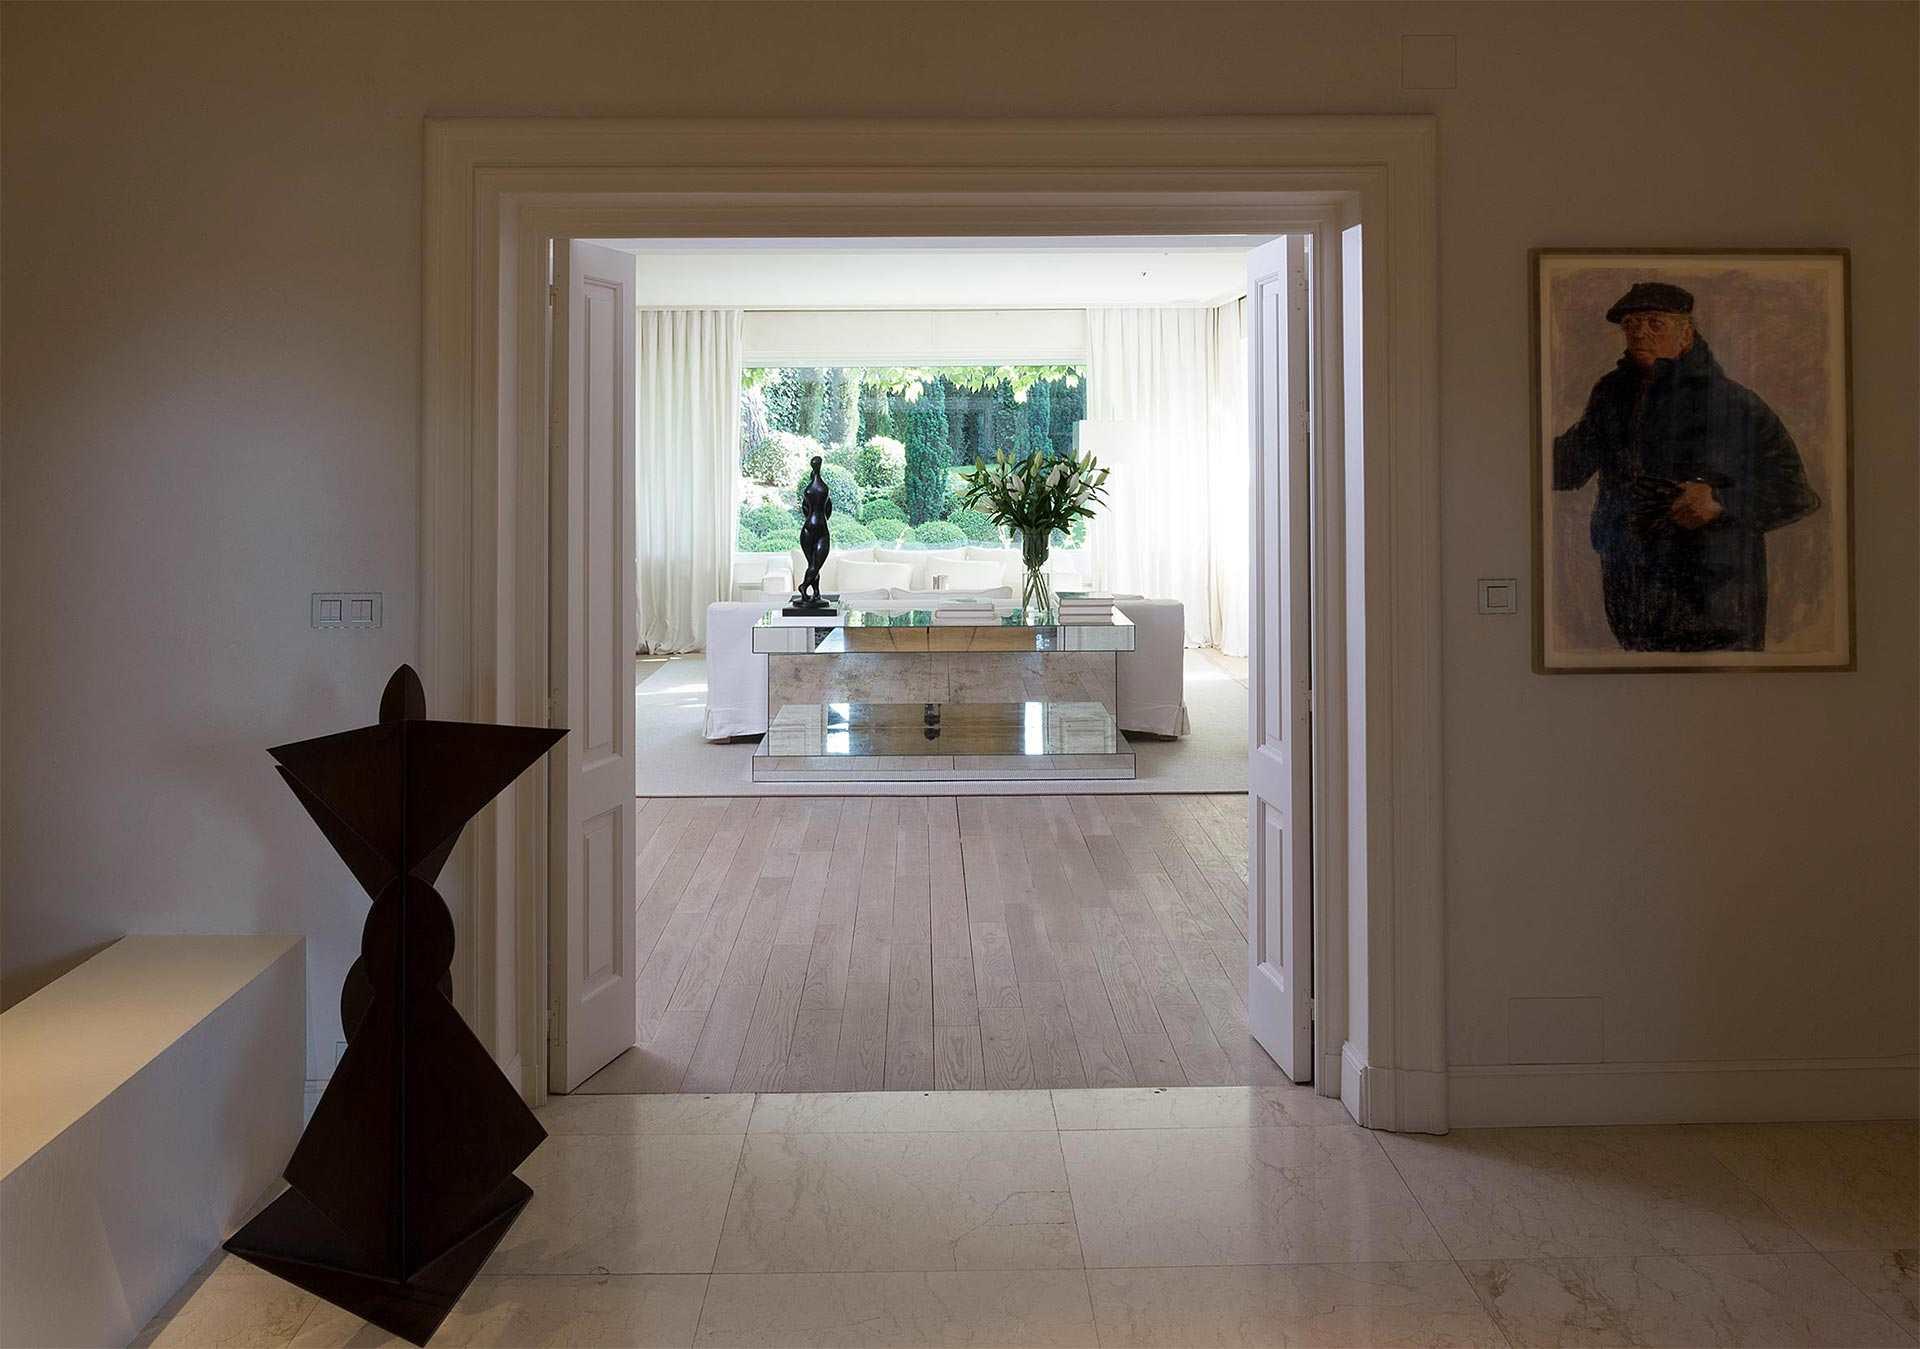 Imagen detalle de la entrada a un salón particular. Iluminación y decoración por estudio de arquitectura e interiorismo Cristina Arechabala.